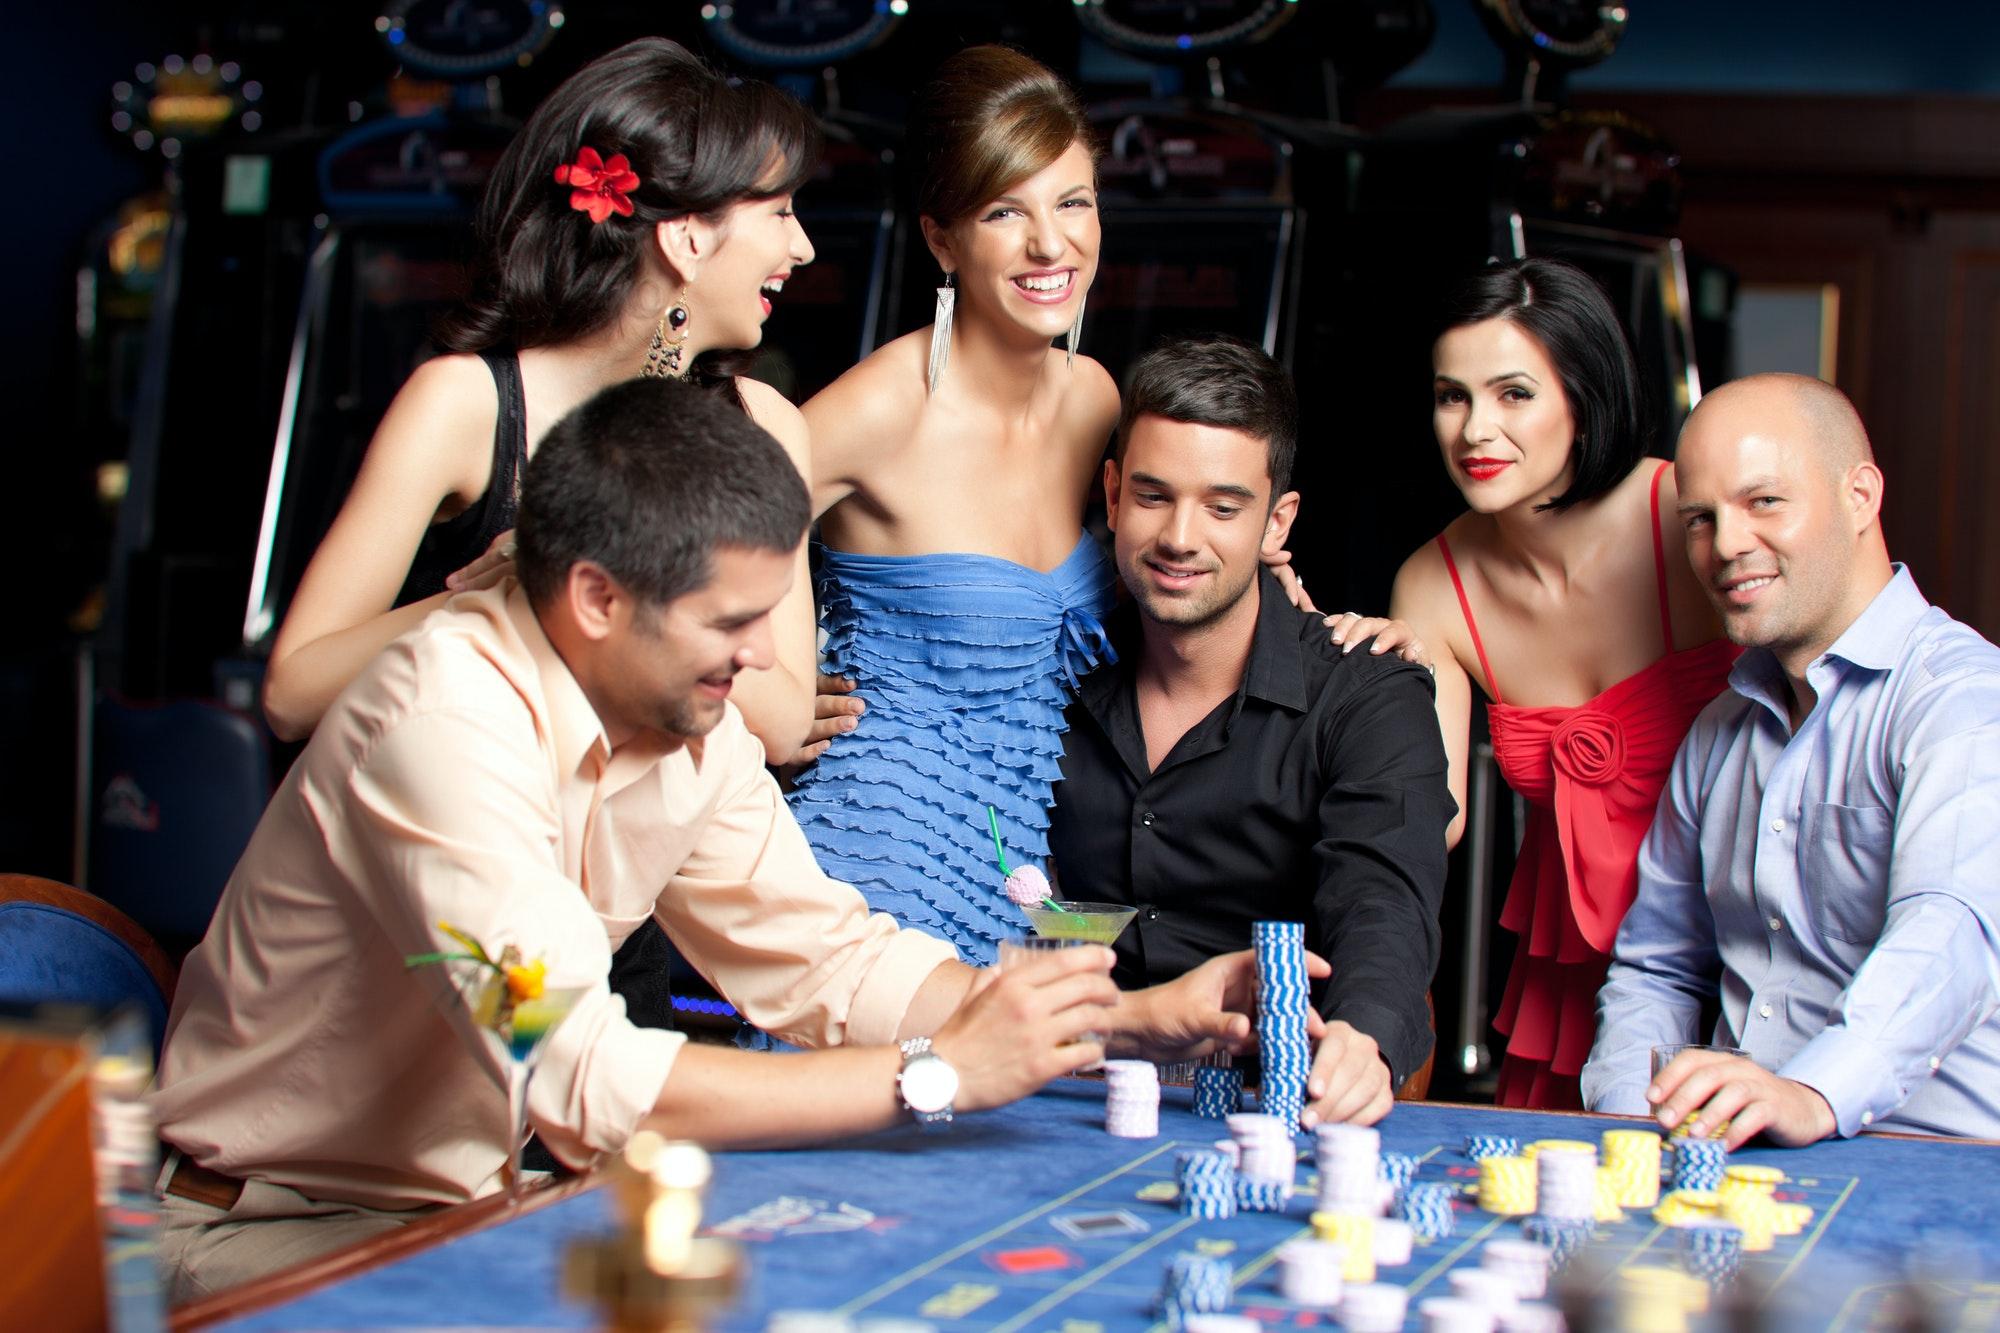 young beautiful people having fun at the casino